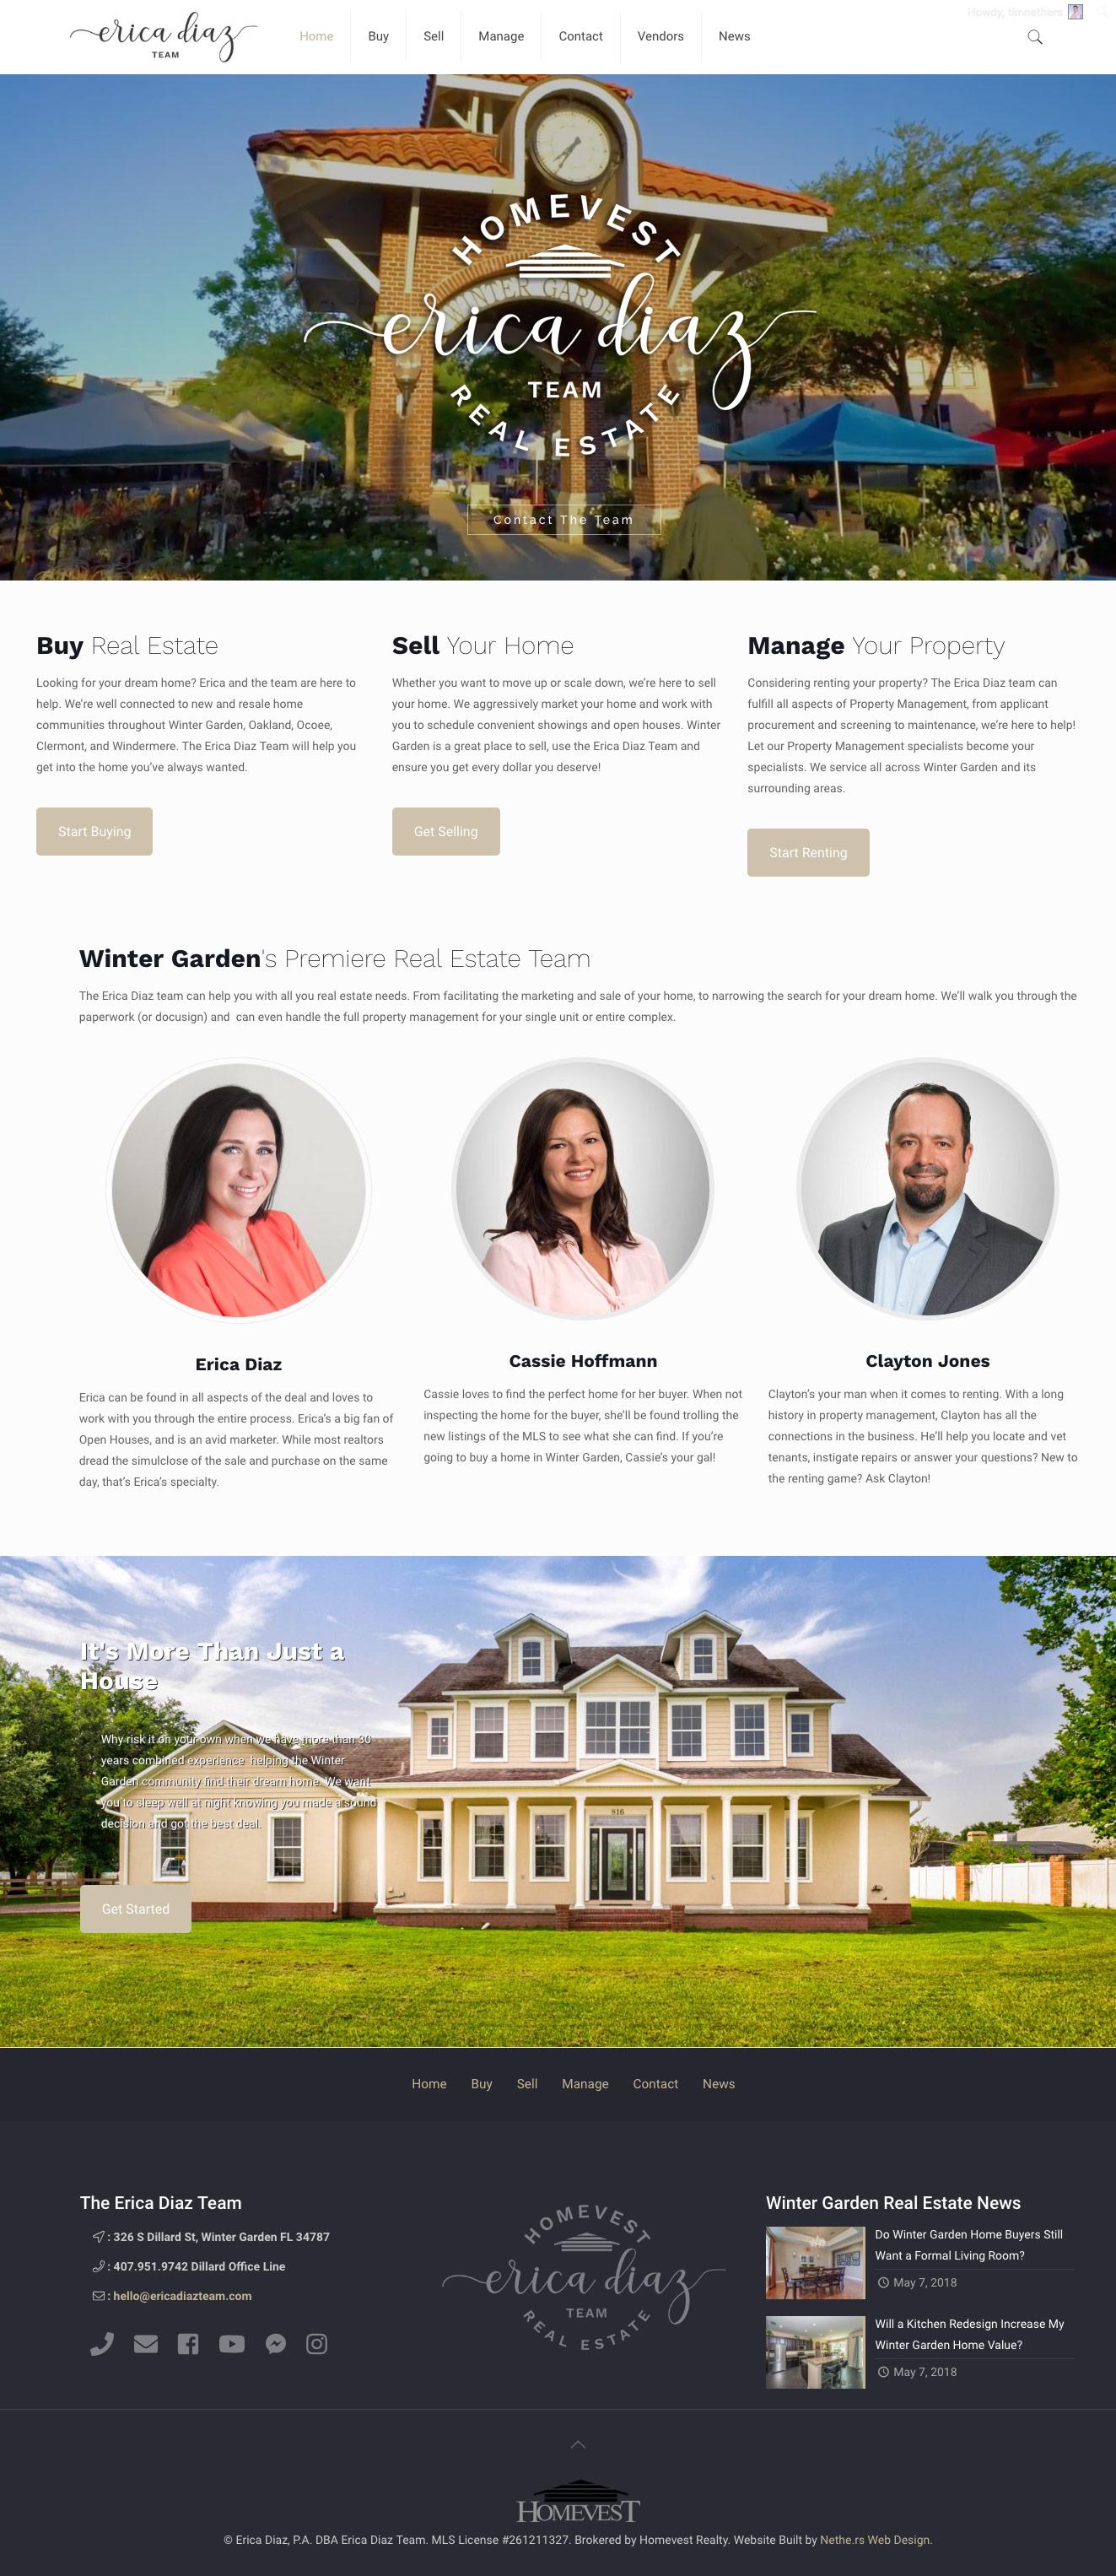 Responsive Website Design for Realtors